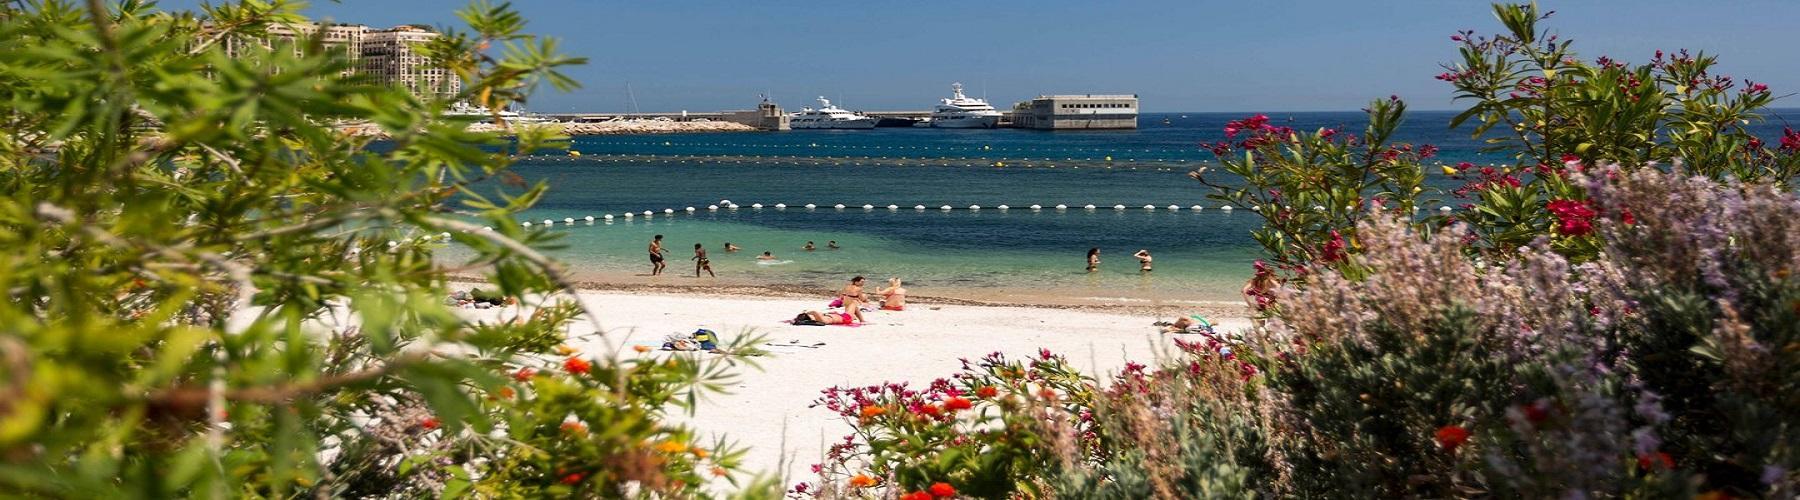 Riviera Marriott Hotel La Porte Монако